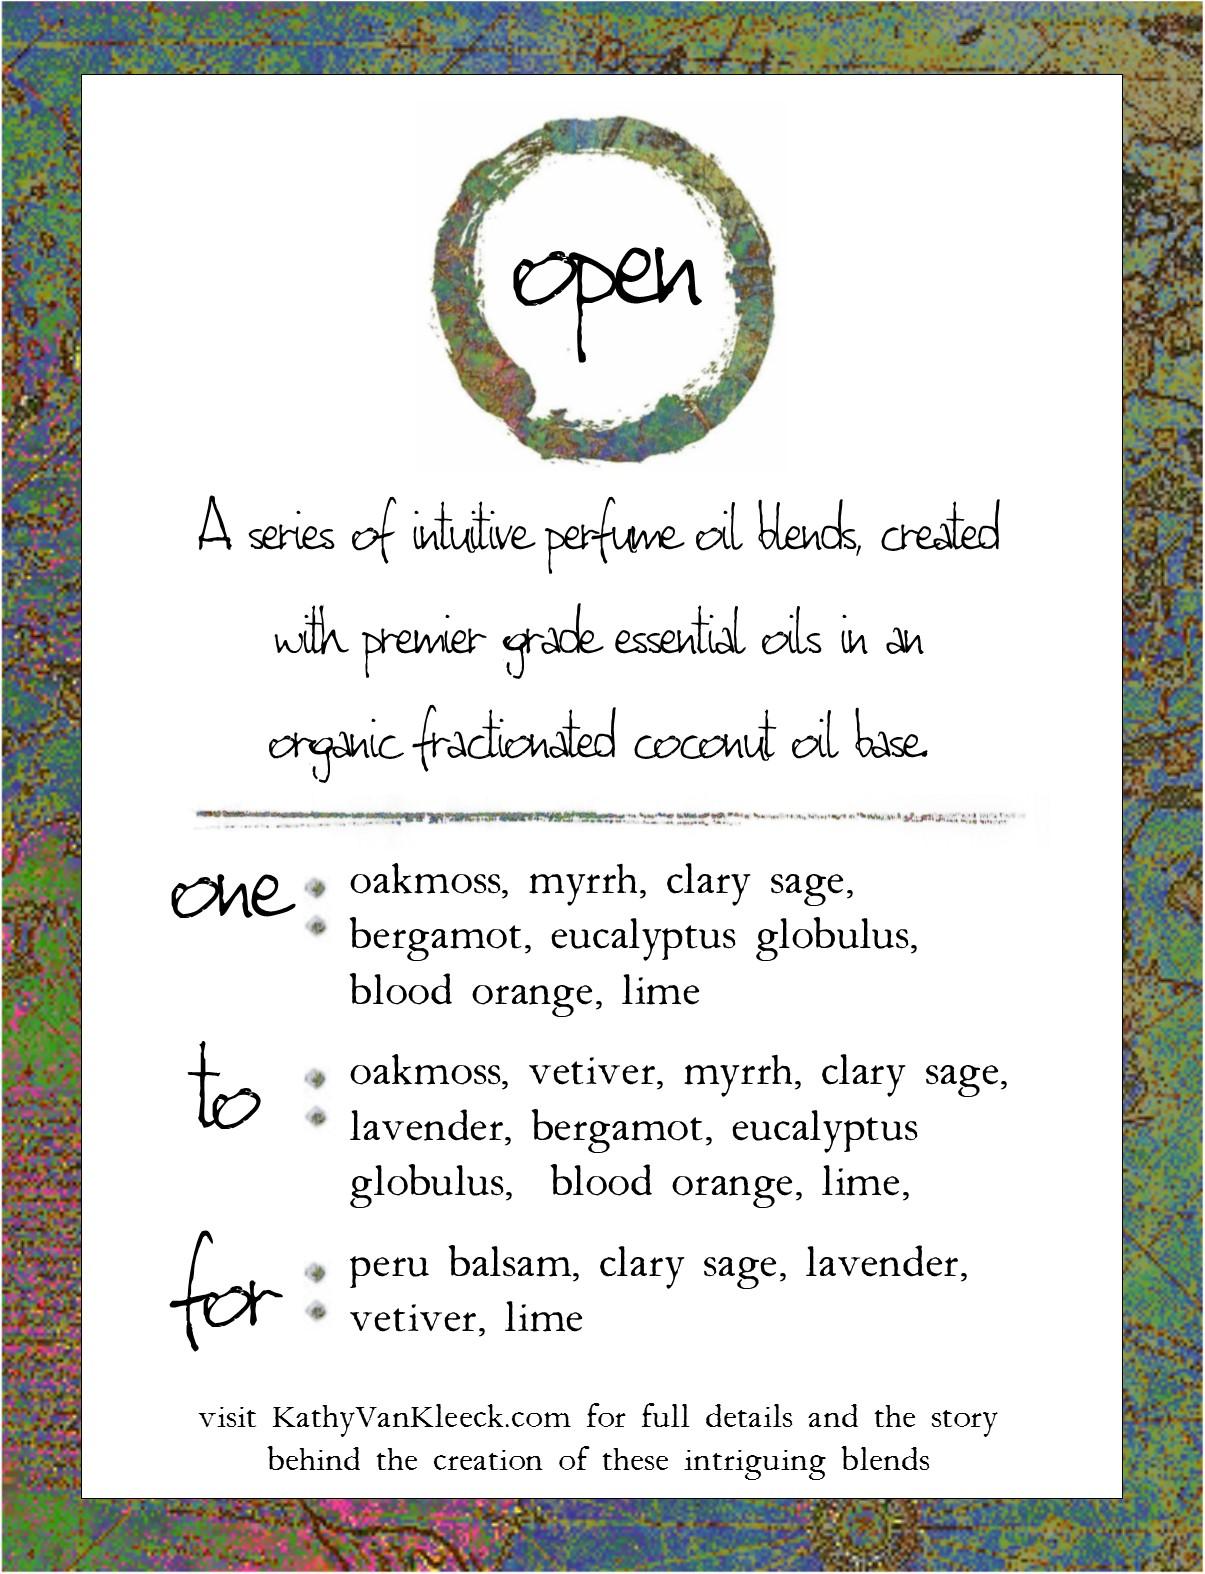 """Open"" series perfume samples info card"